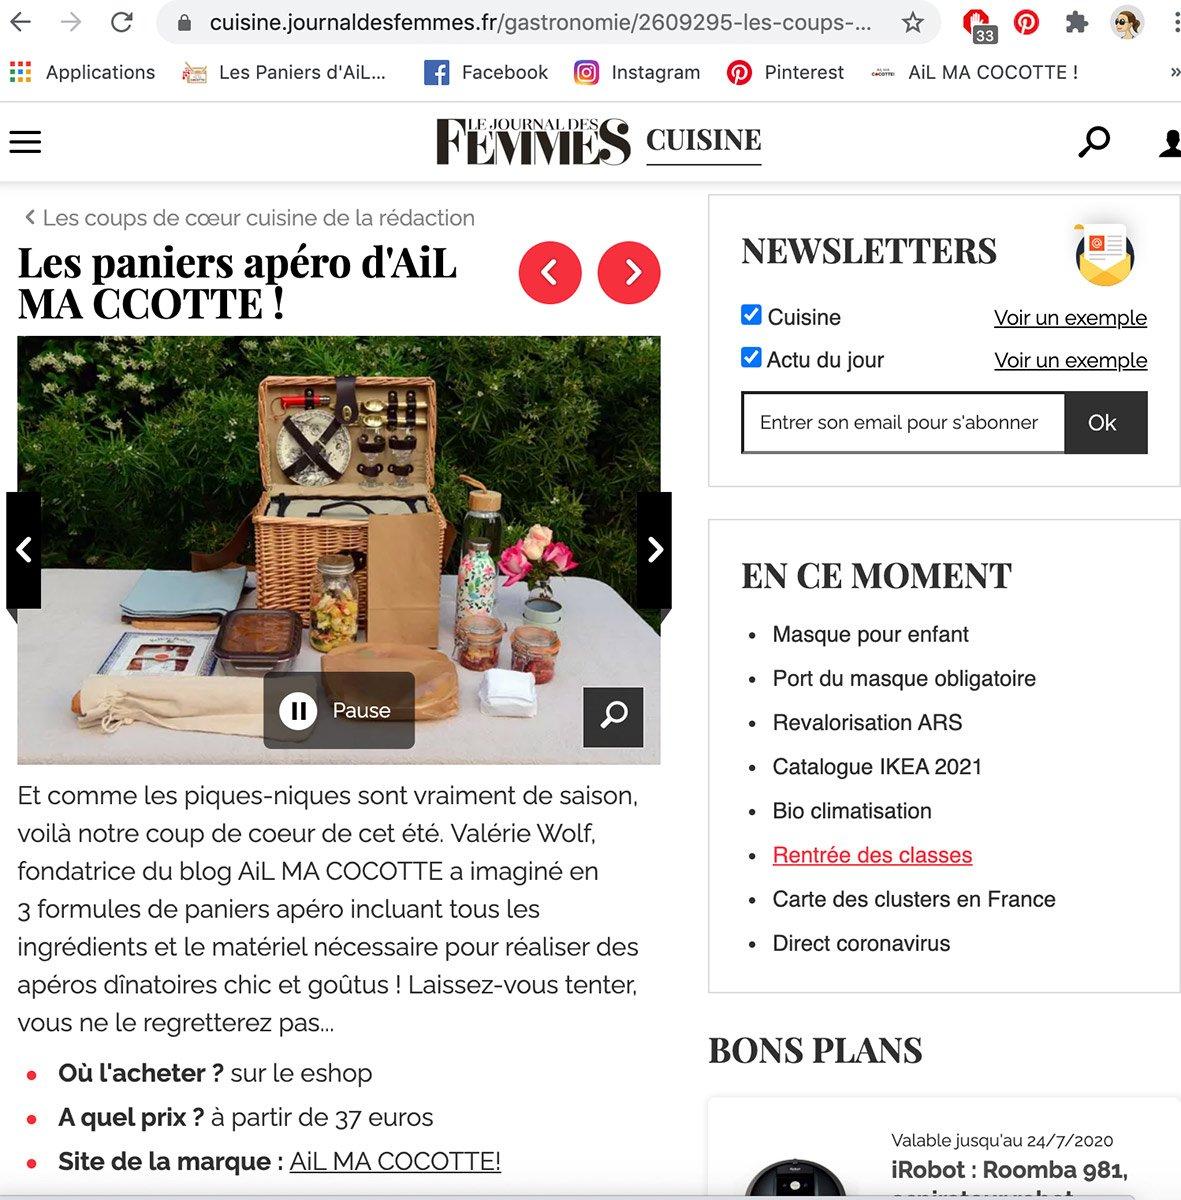 Le Journal des Femmes, ailmacocotte.com